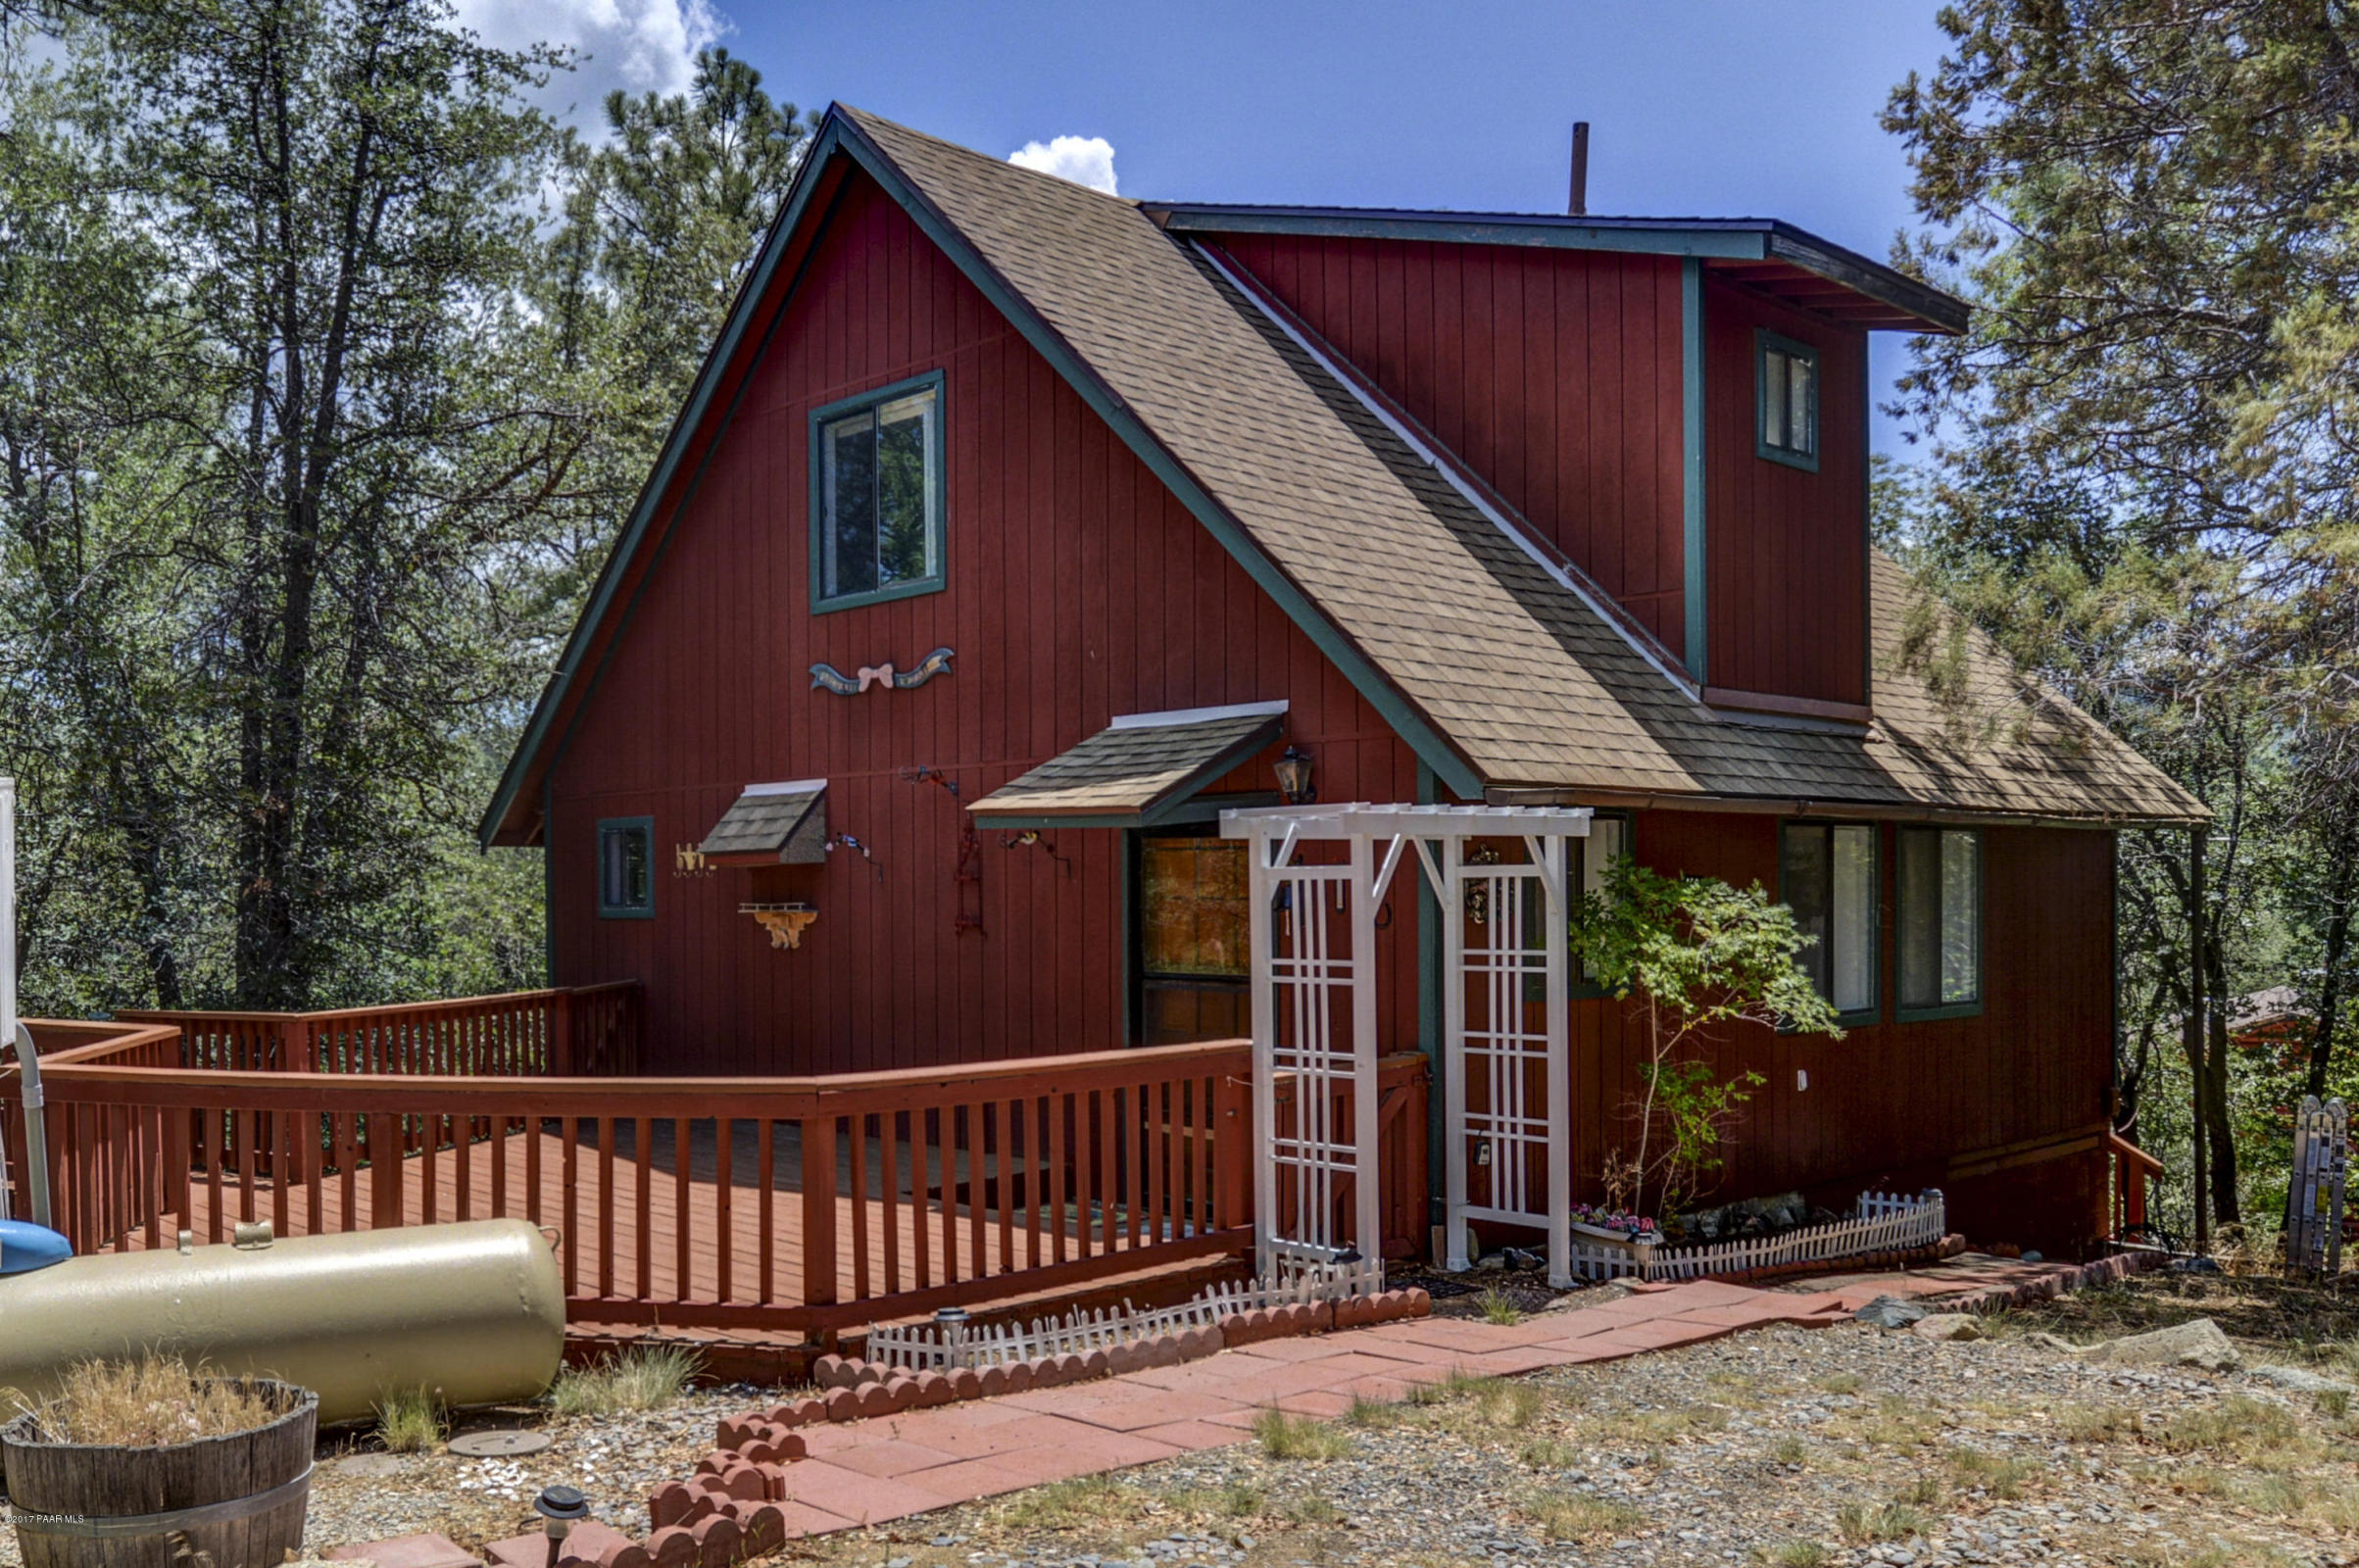 4891 S. Deer Trail, Prescott, AZ 86303